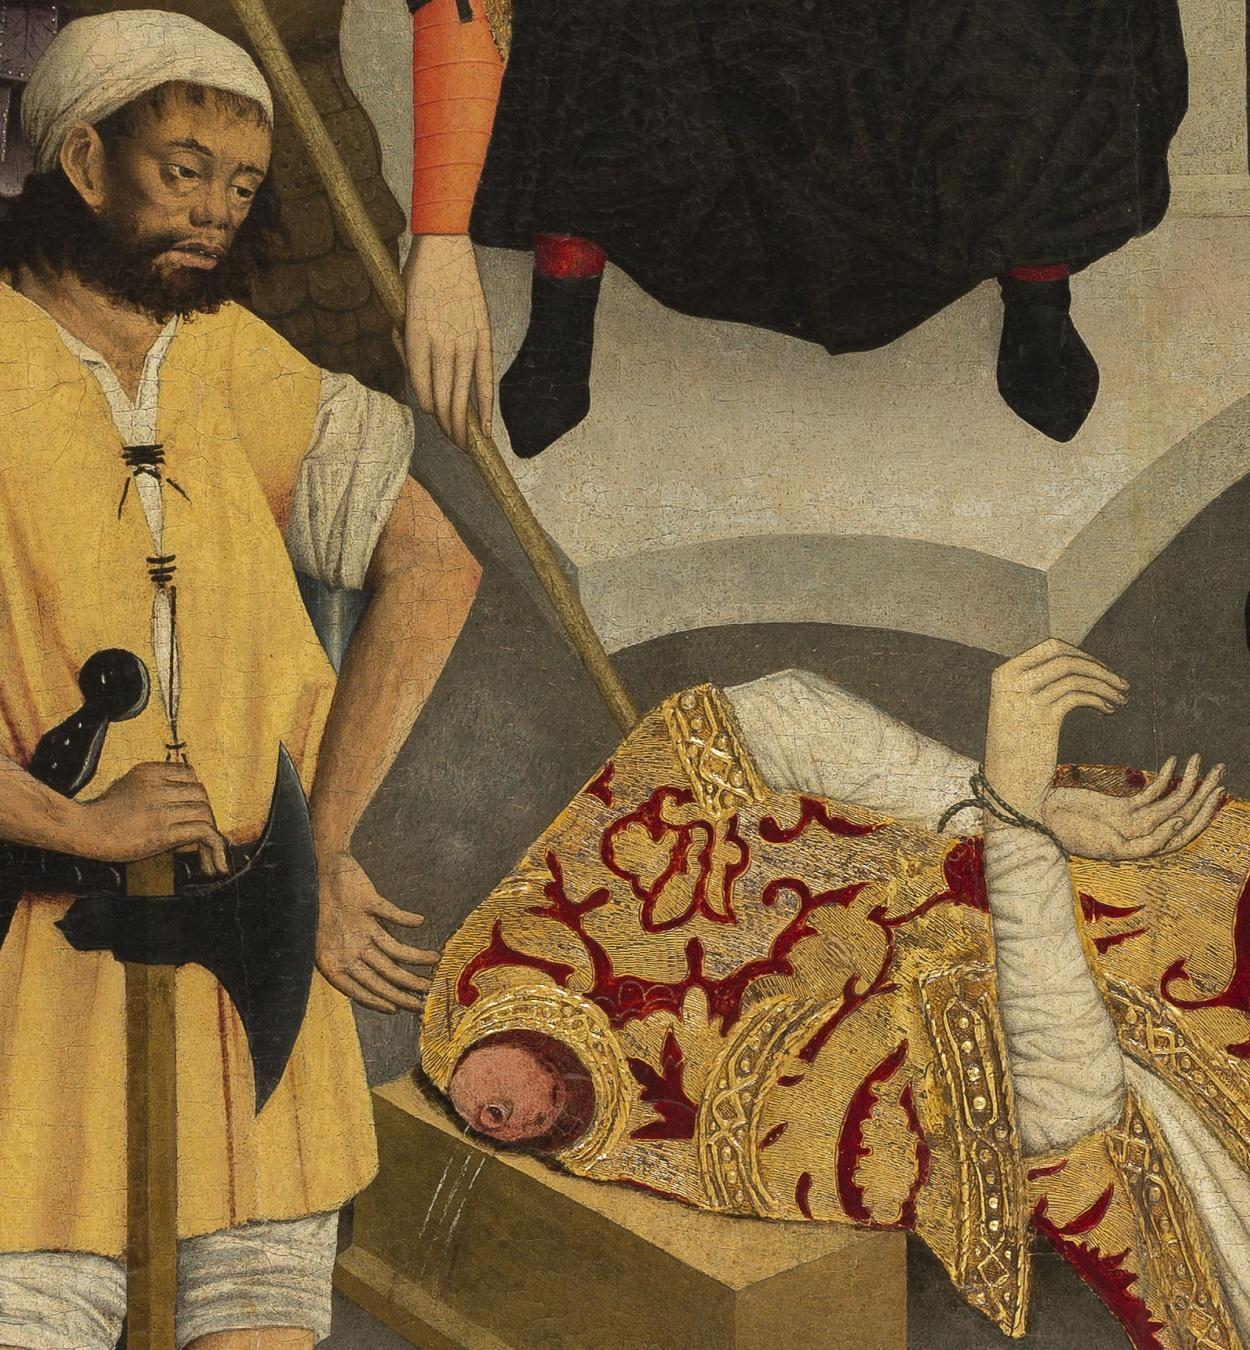 Lluís Dalmau - The Beheading of Saint Baudilus - circa 1448 [3]